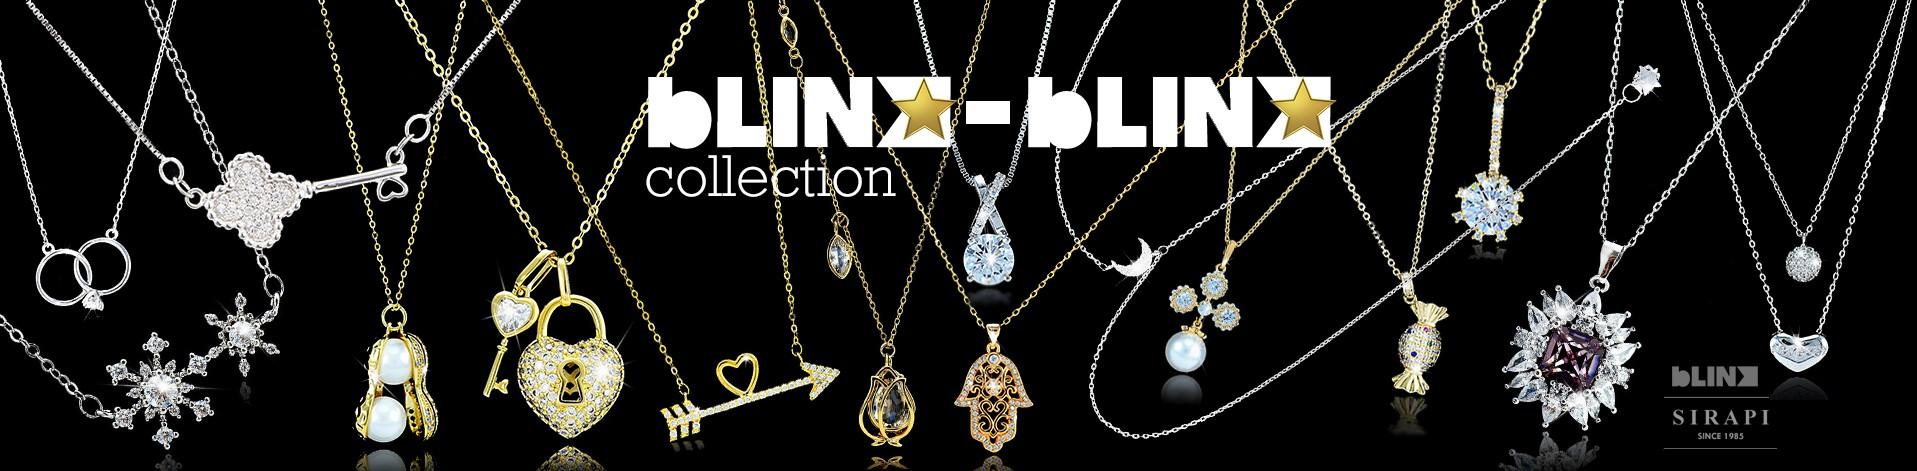 Retiazky - SIRAPI /kolekcia BLINK-BLINK/